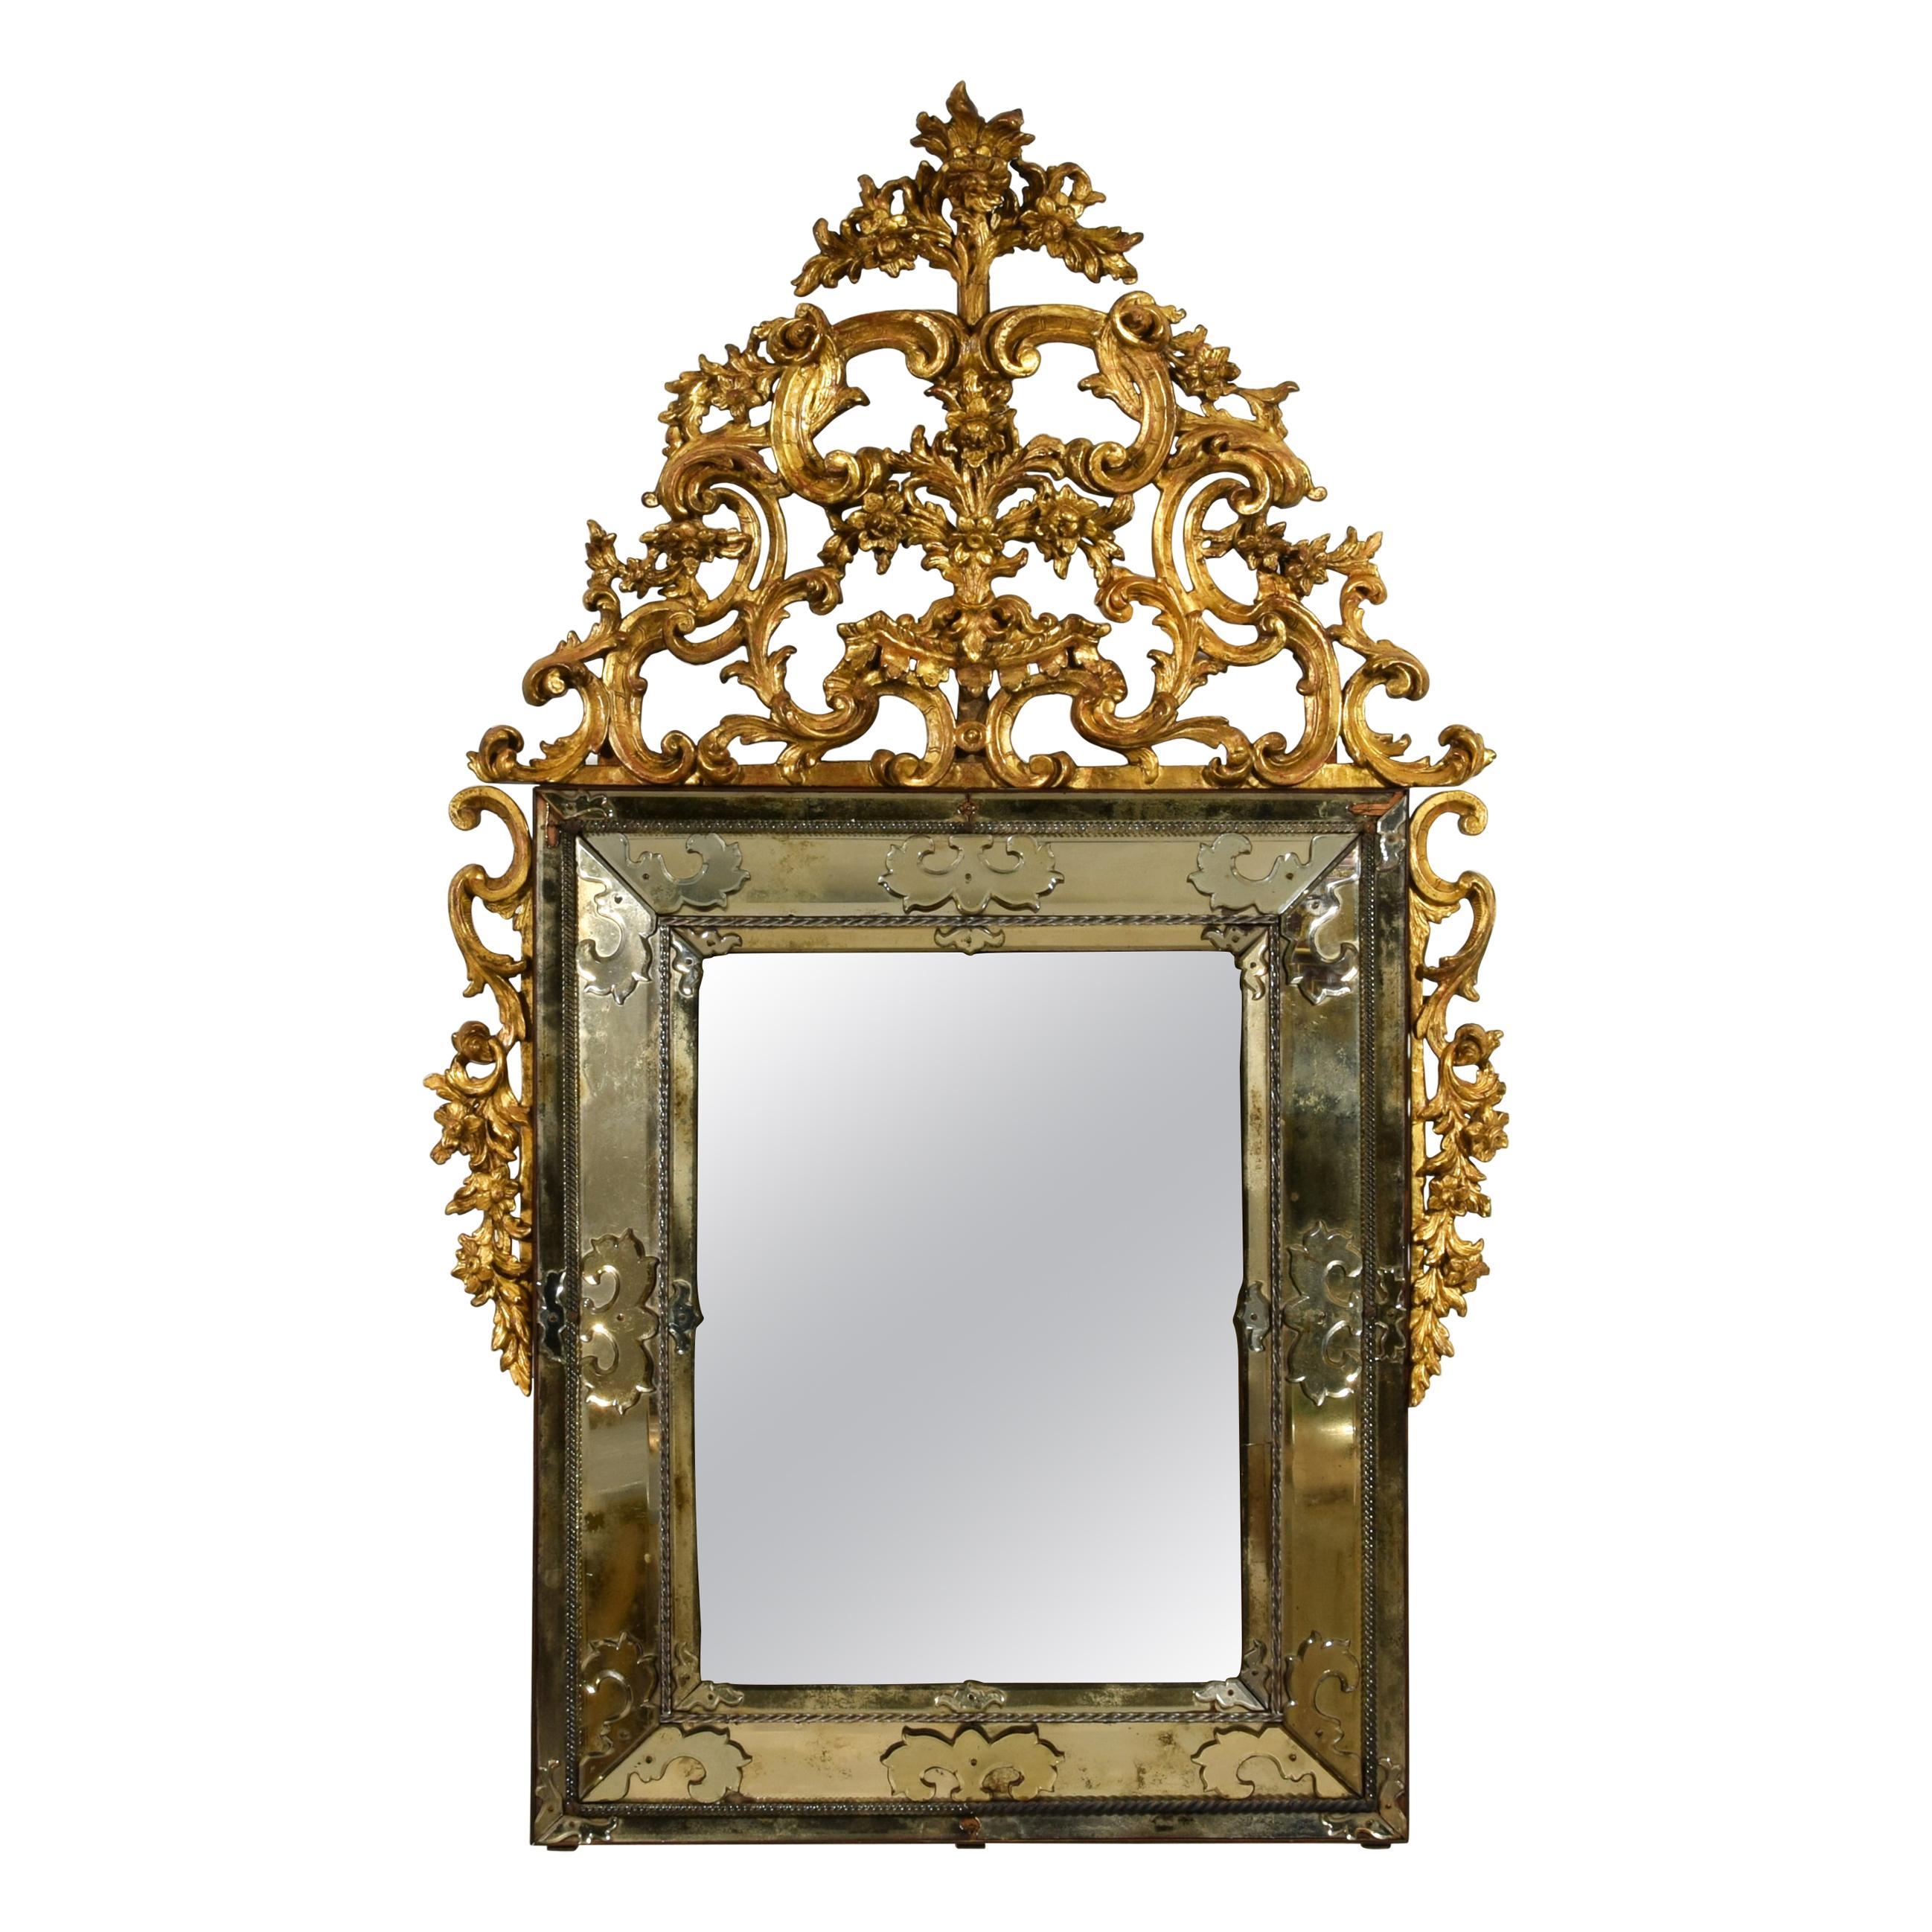 19th Century, Italian Carved Giltwood Mirror, Italy